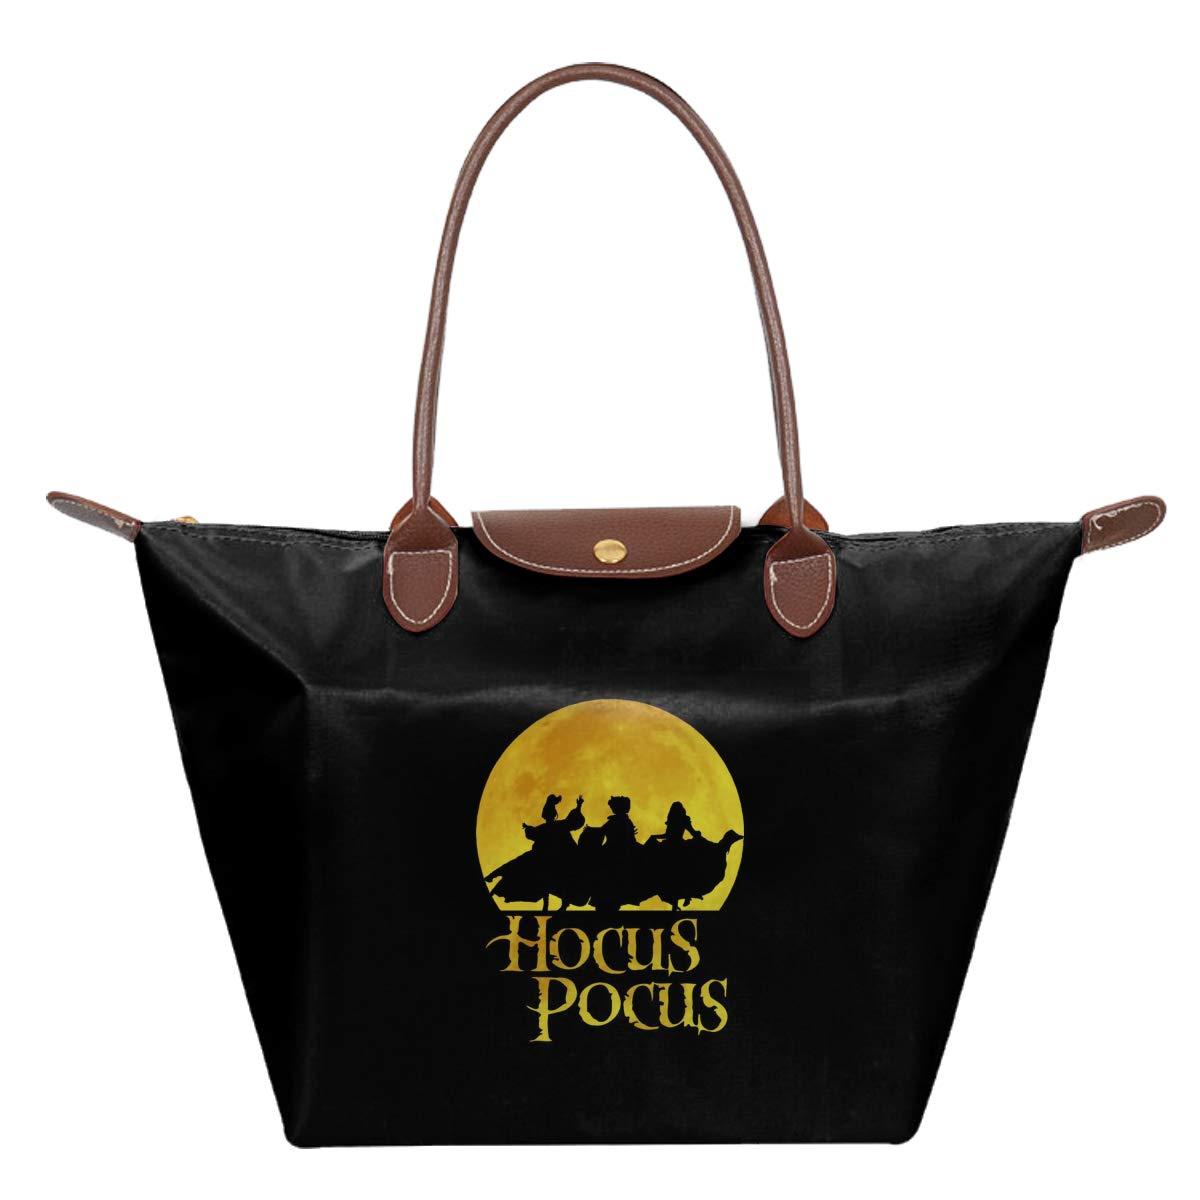 Hocus Pocus Dancing Moon Silhouette Waterproof Leather Folded Messenger Nylon Bag Travel Tote Hopping Folding School Handbags